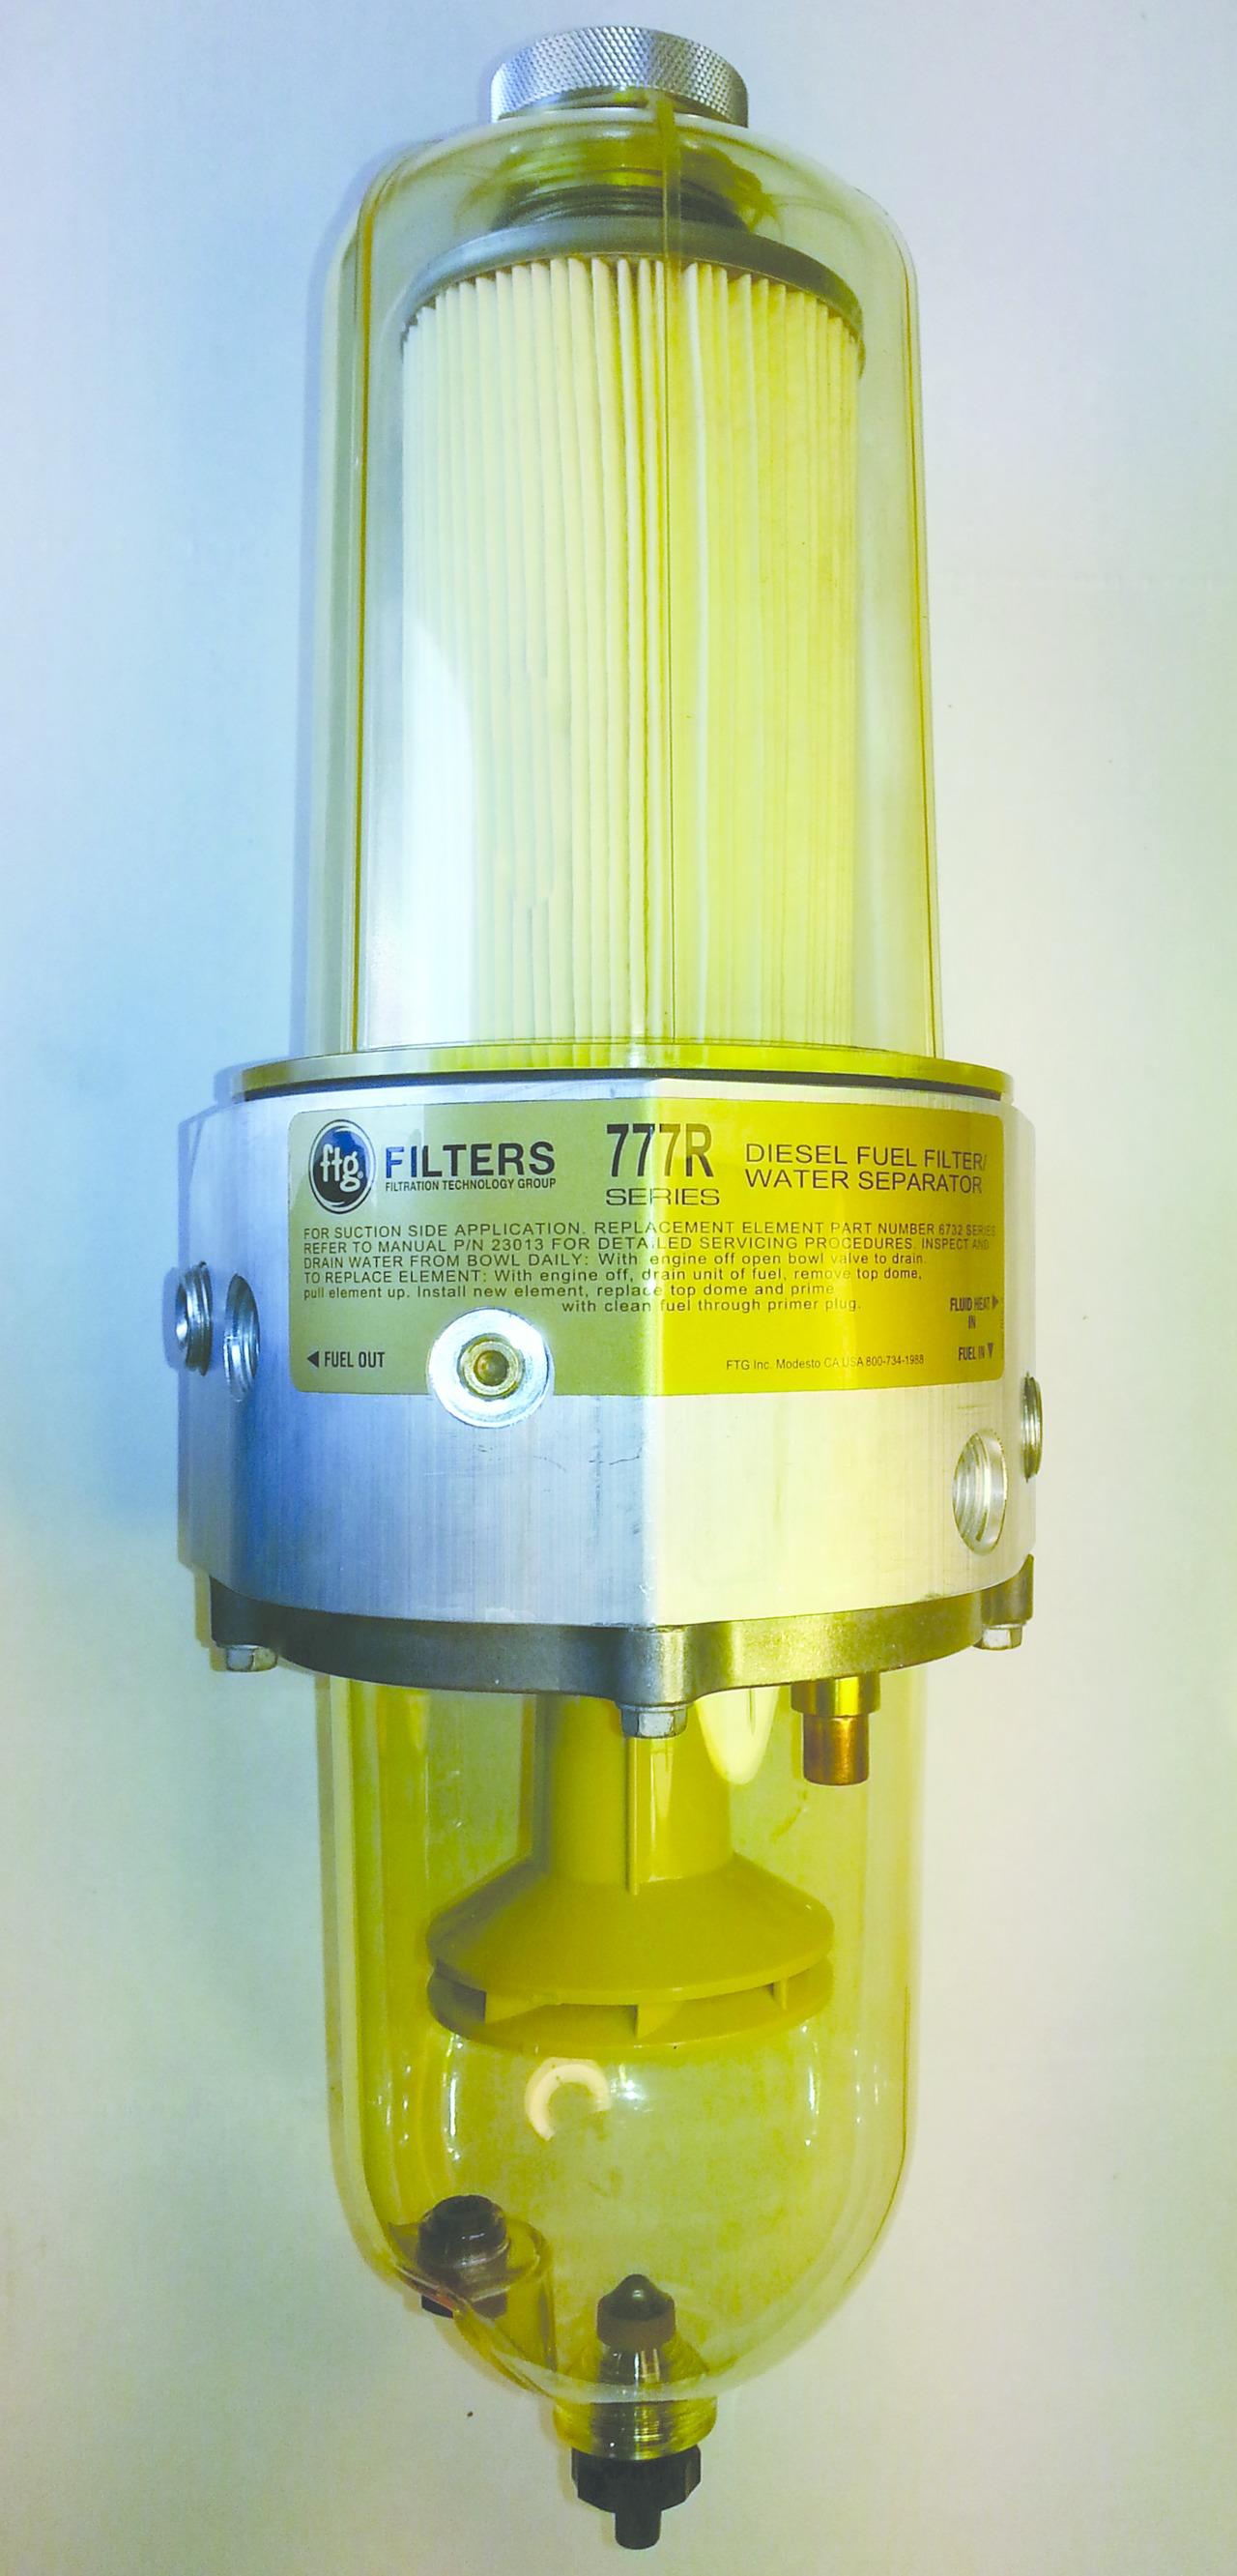 hight resolution of ftg fuel filter water separator heater 777r 5489eff111077